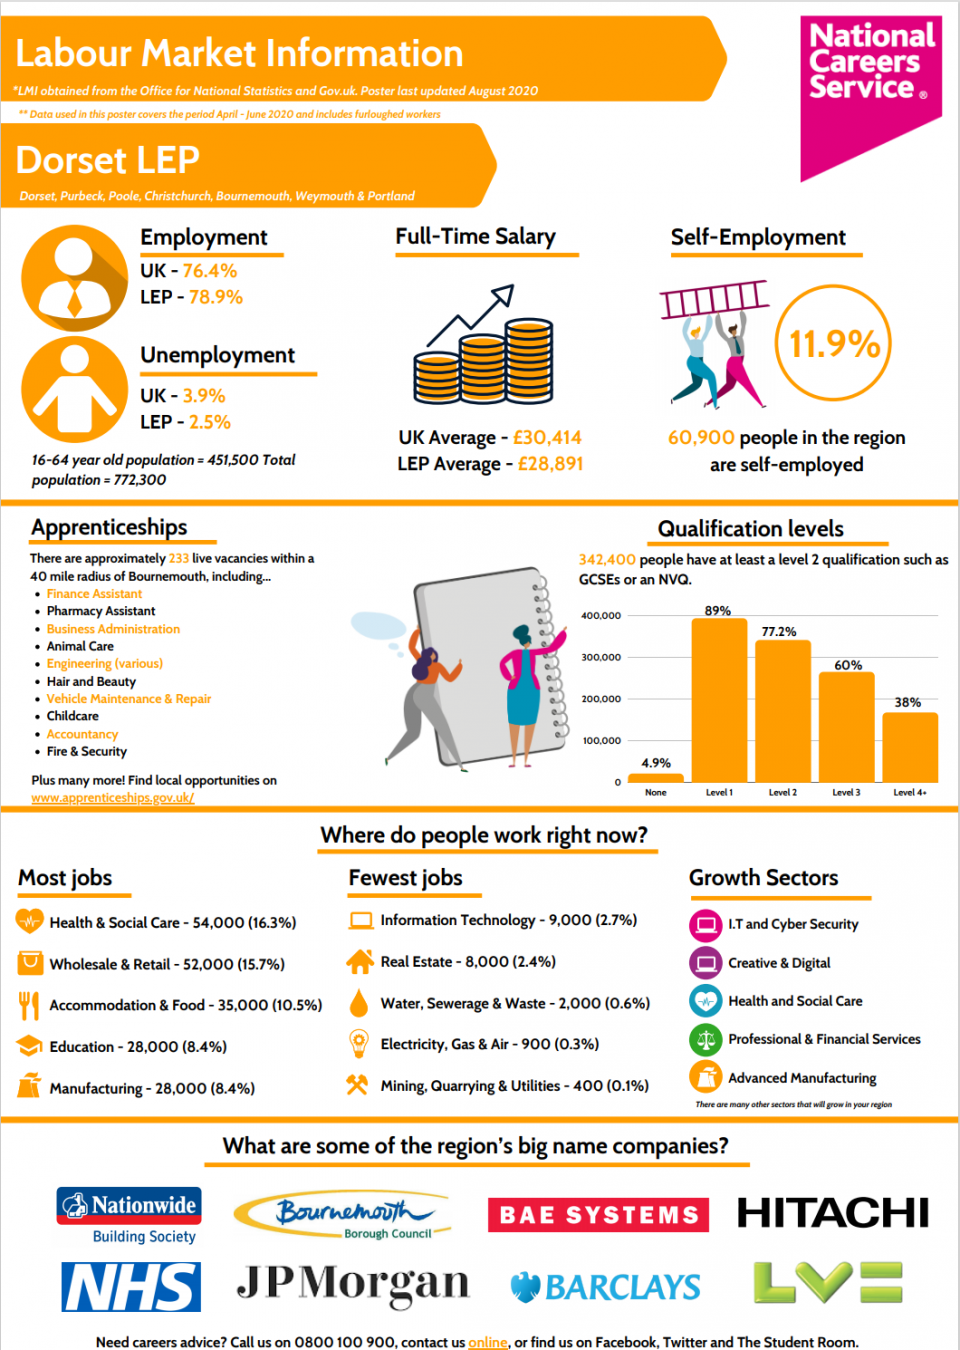 Careerpilot Get Information Finding A Job Experience Job Growth Near Me